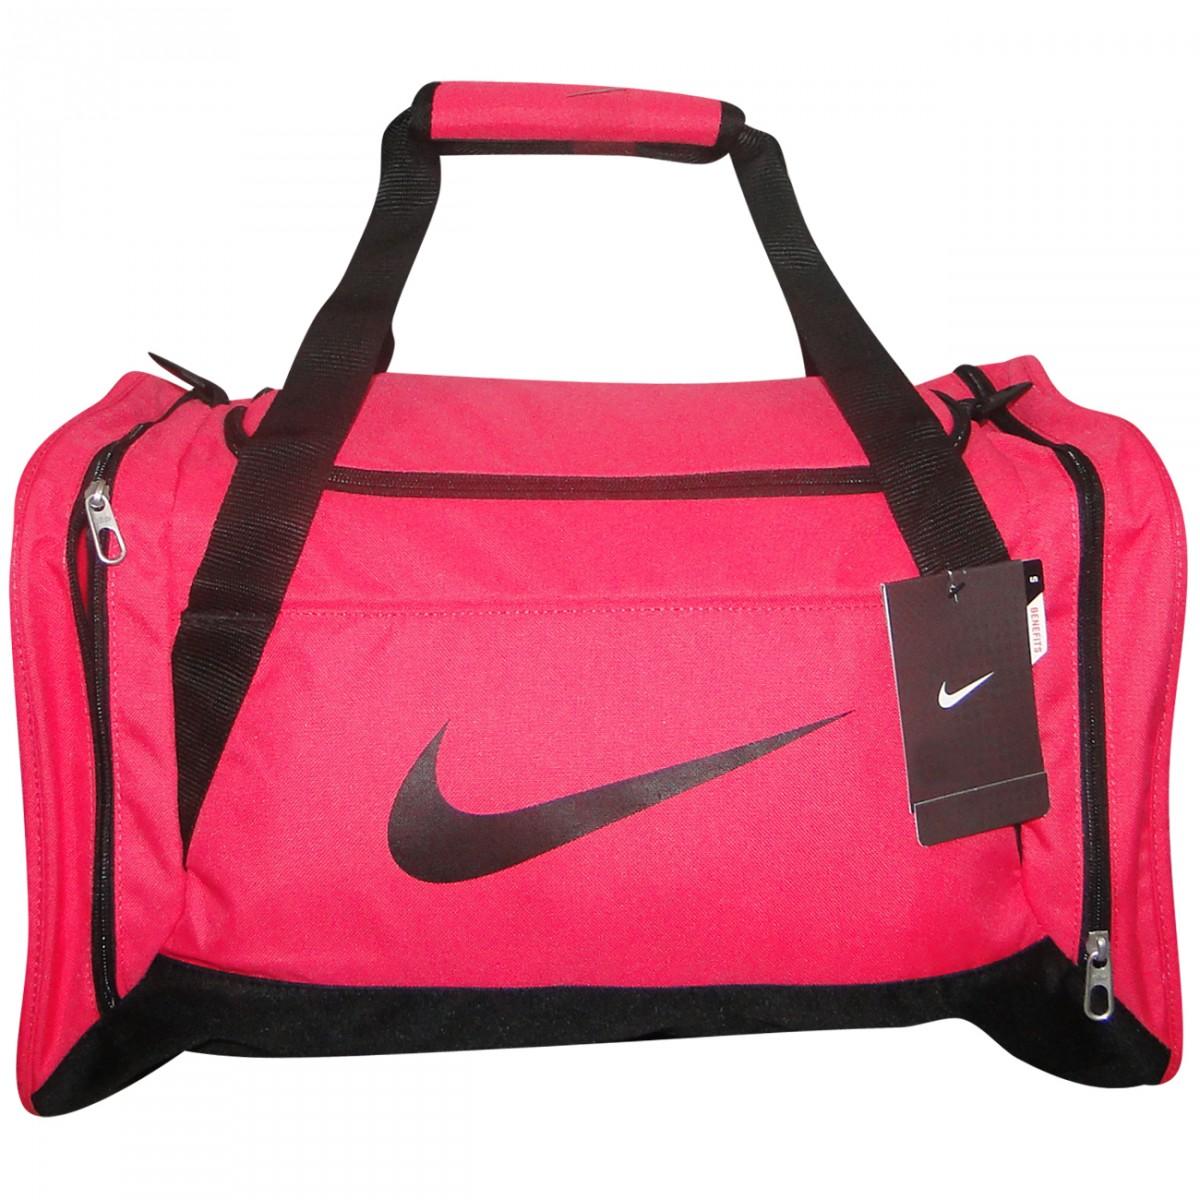 a868c5dac Bolsa Nike BA4910 BA4910 606 - Pink/Preto - Chuteira Nike, Adidas ...